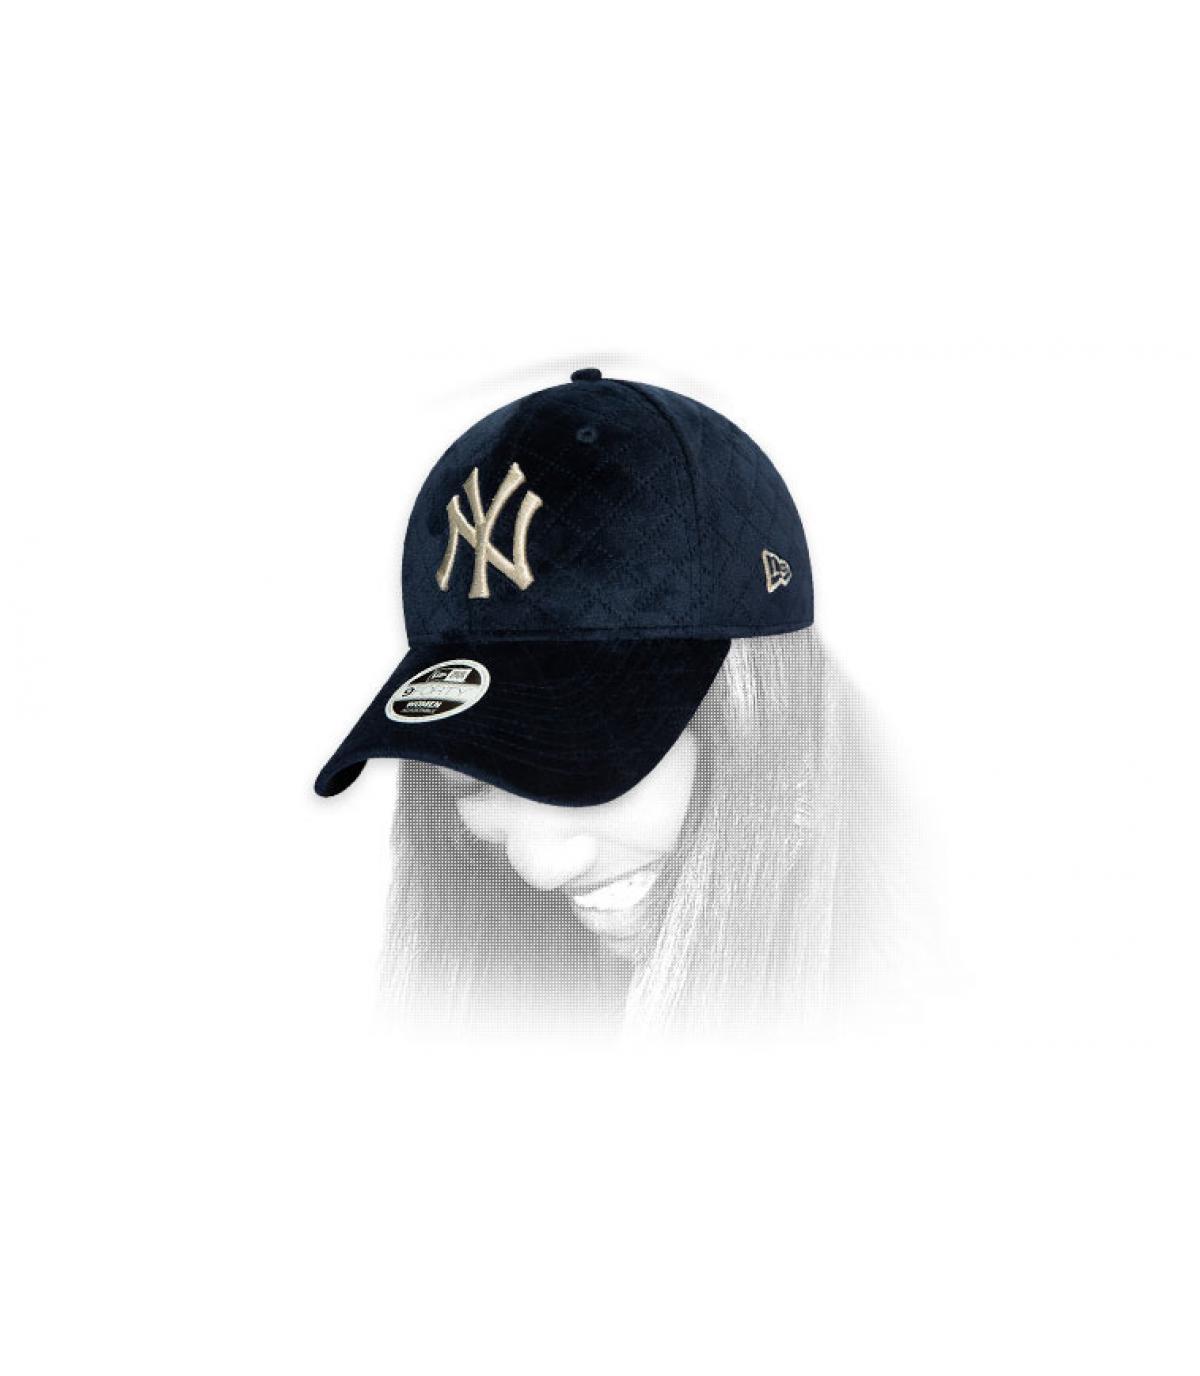 casquette femme NY bleu